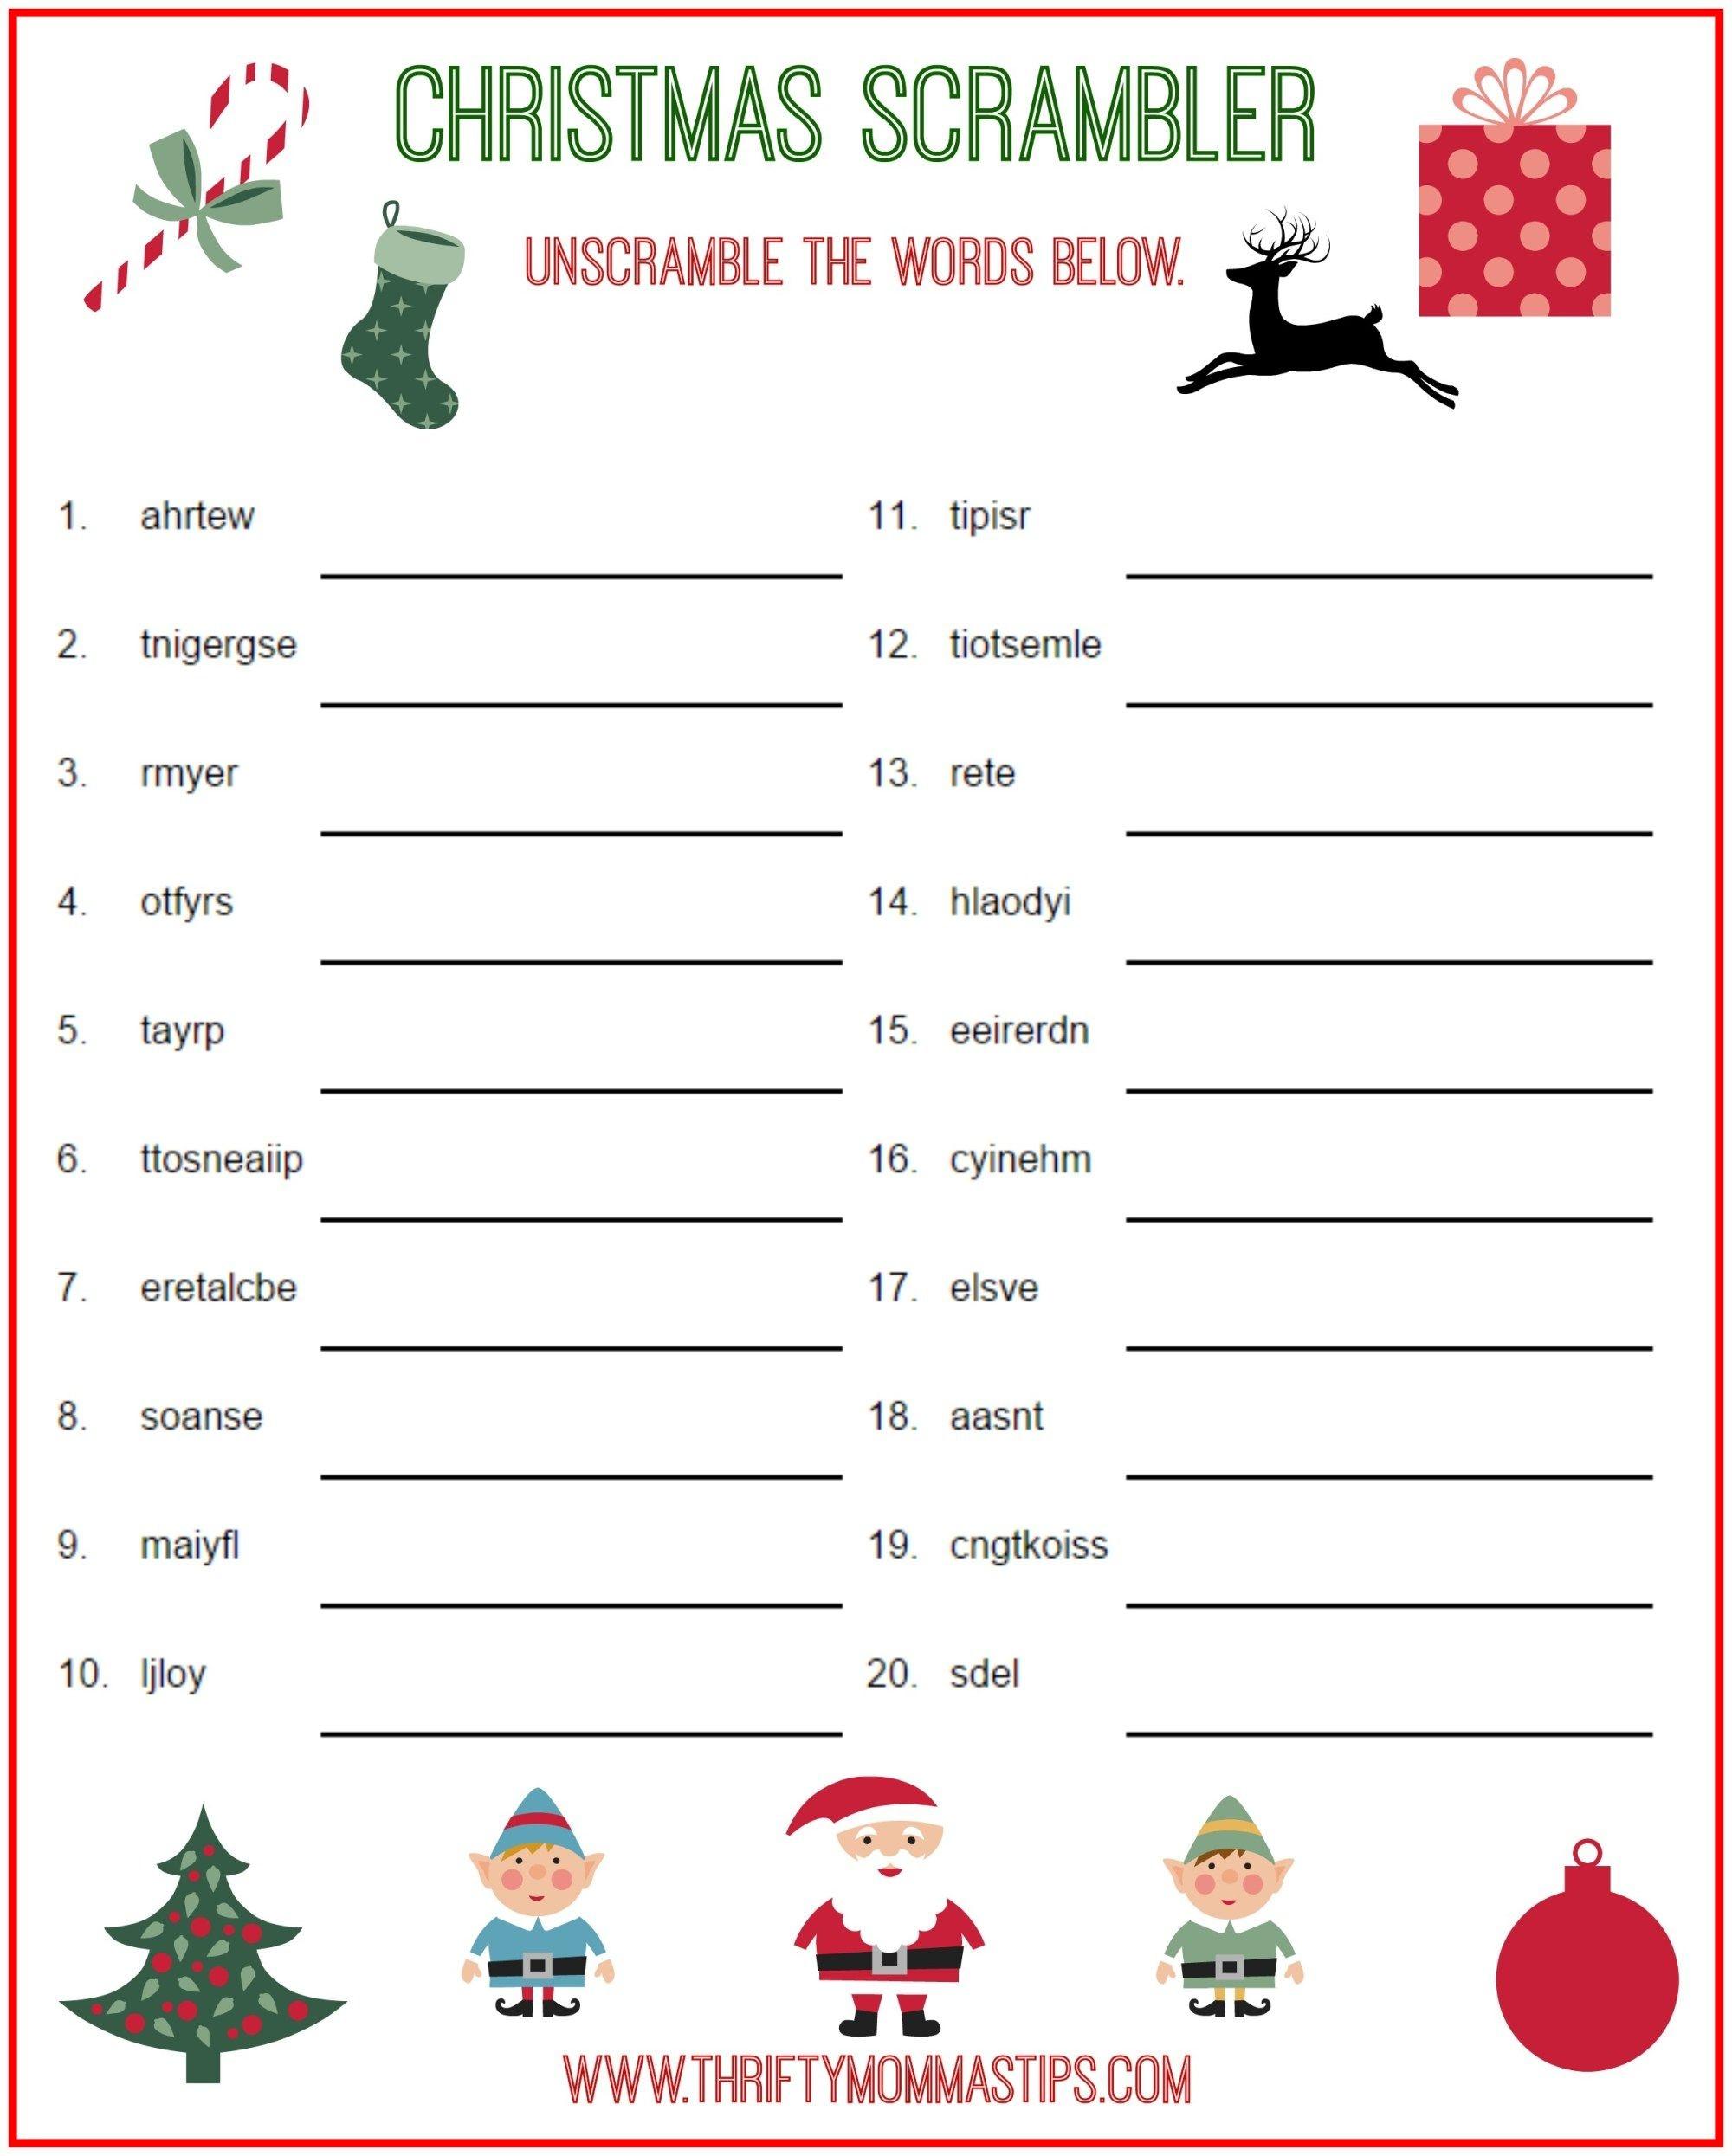 Christmas Scrambler Free Kids Puzzle Printables | Christmas Family - Free Printable Christmas Puzzles